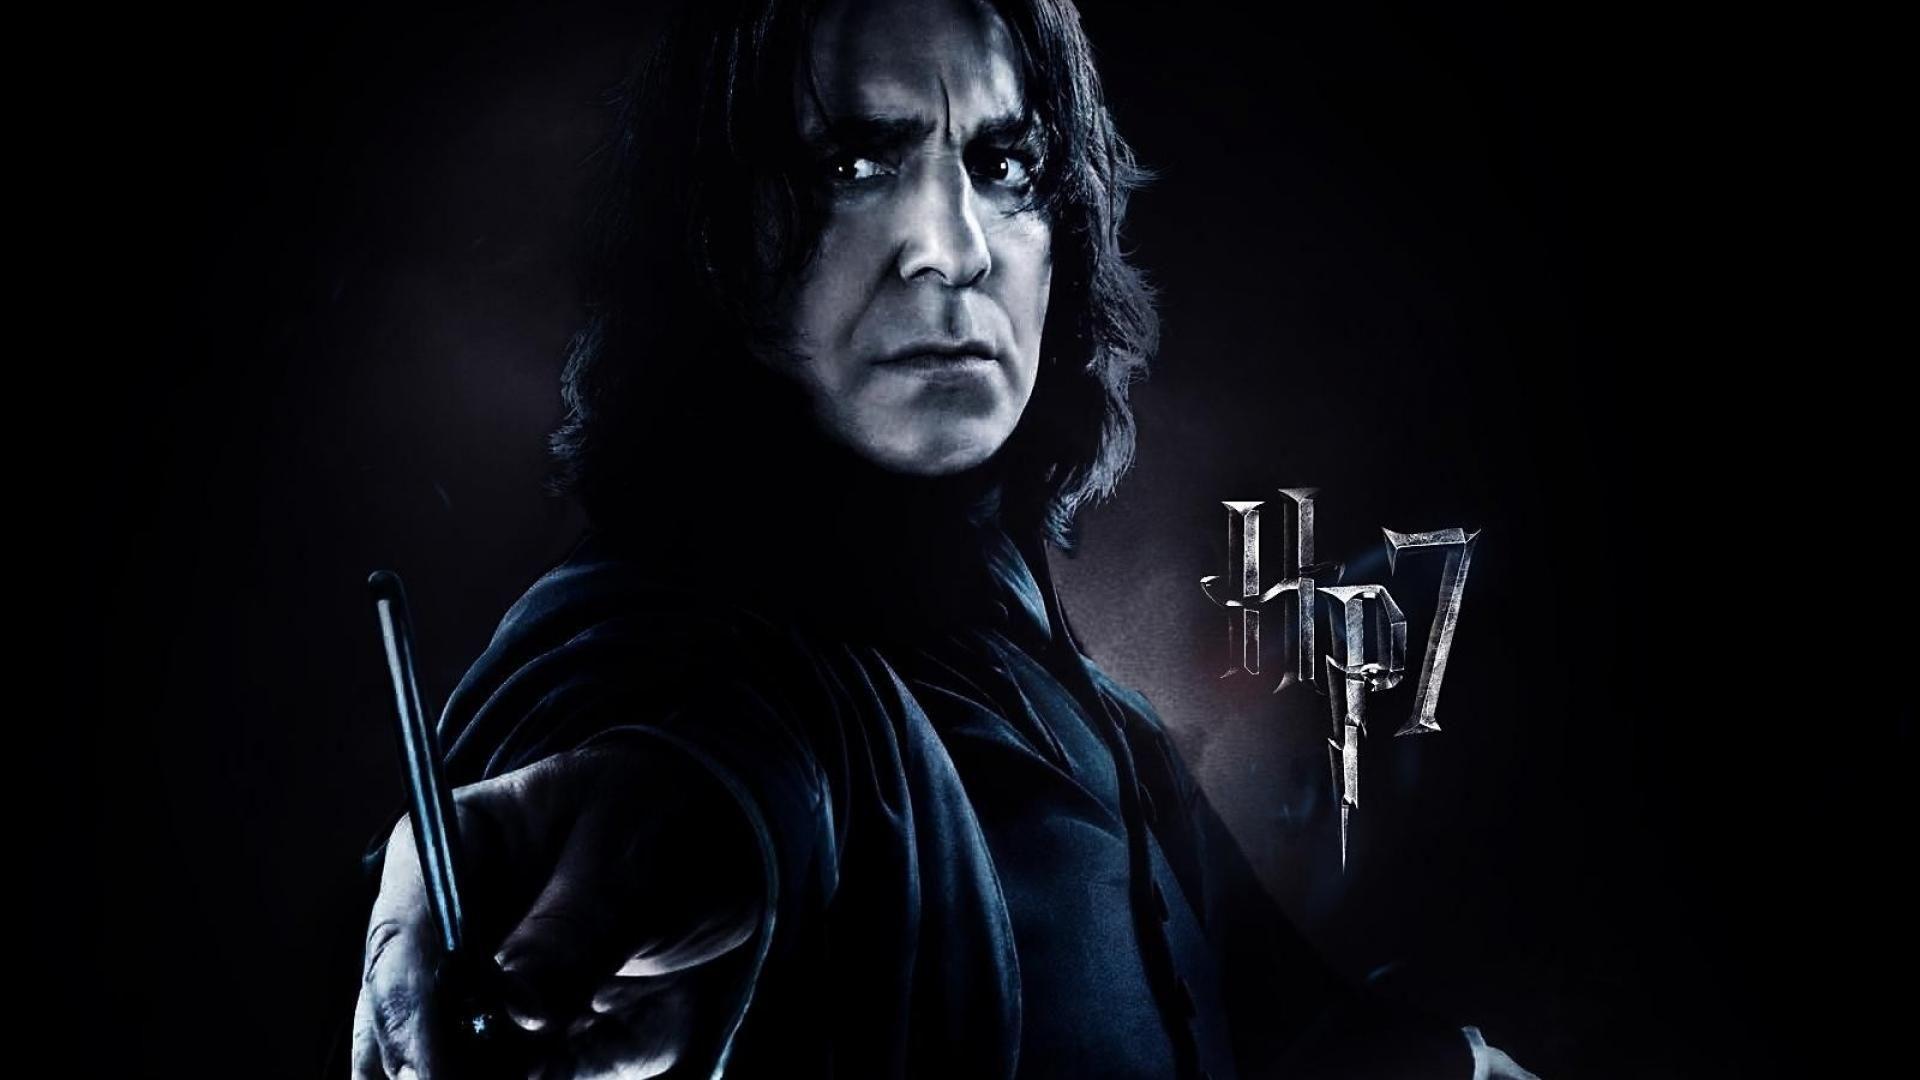 Alan Rickman as Severus Snape   Severus Snape Wallpaper